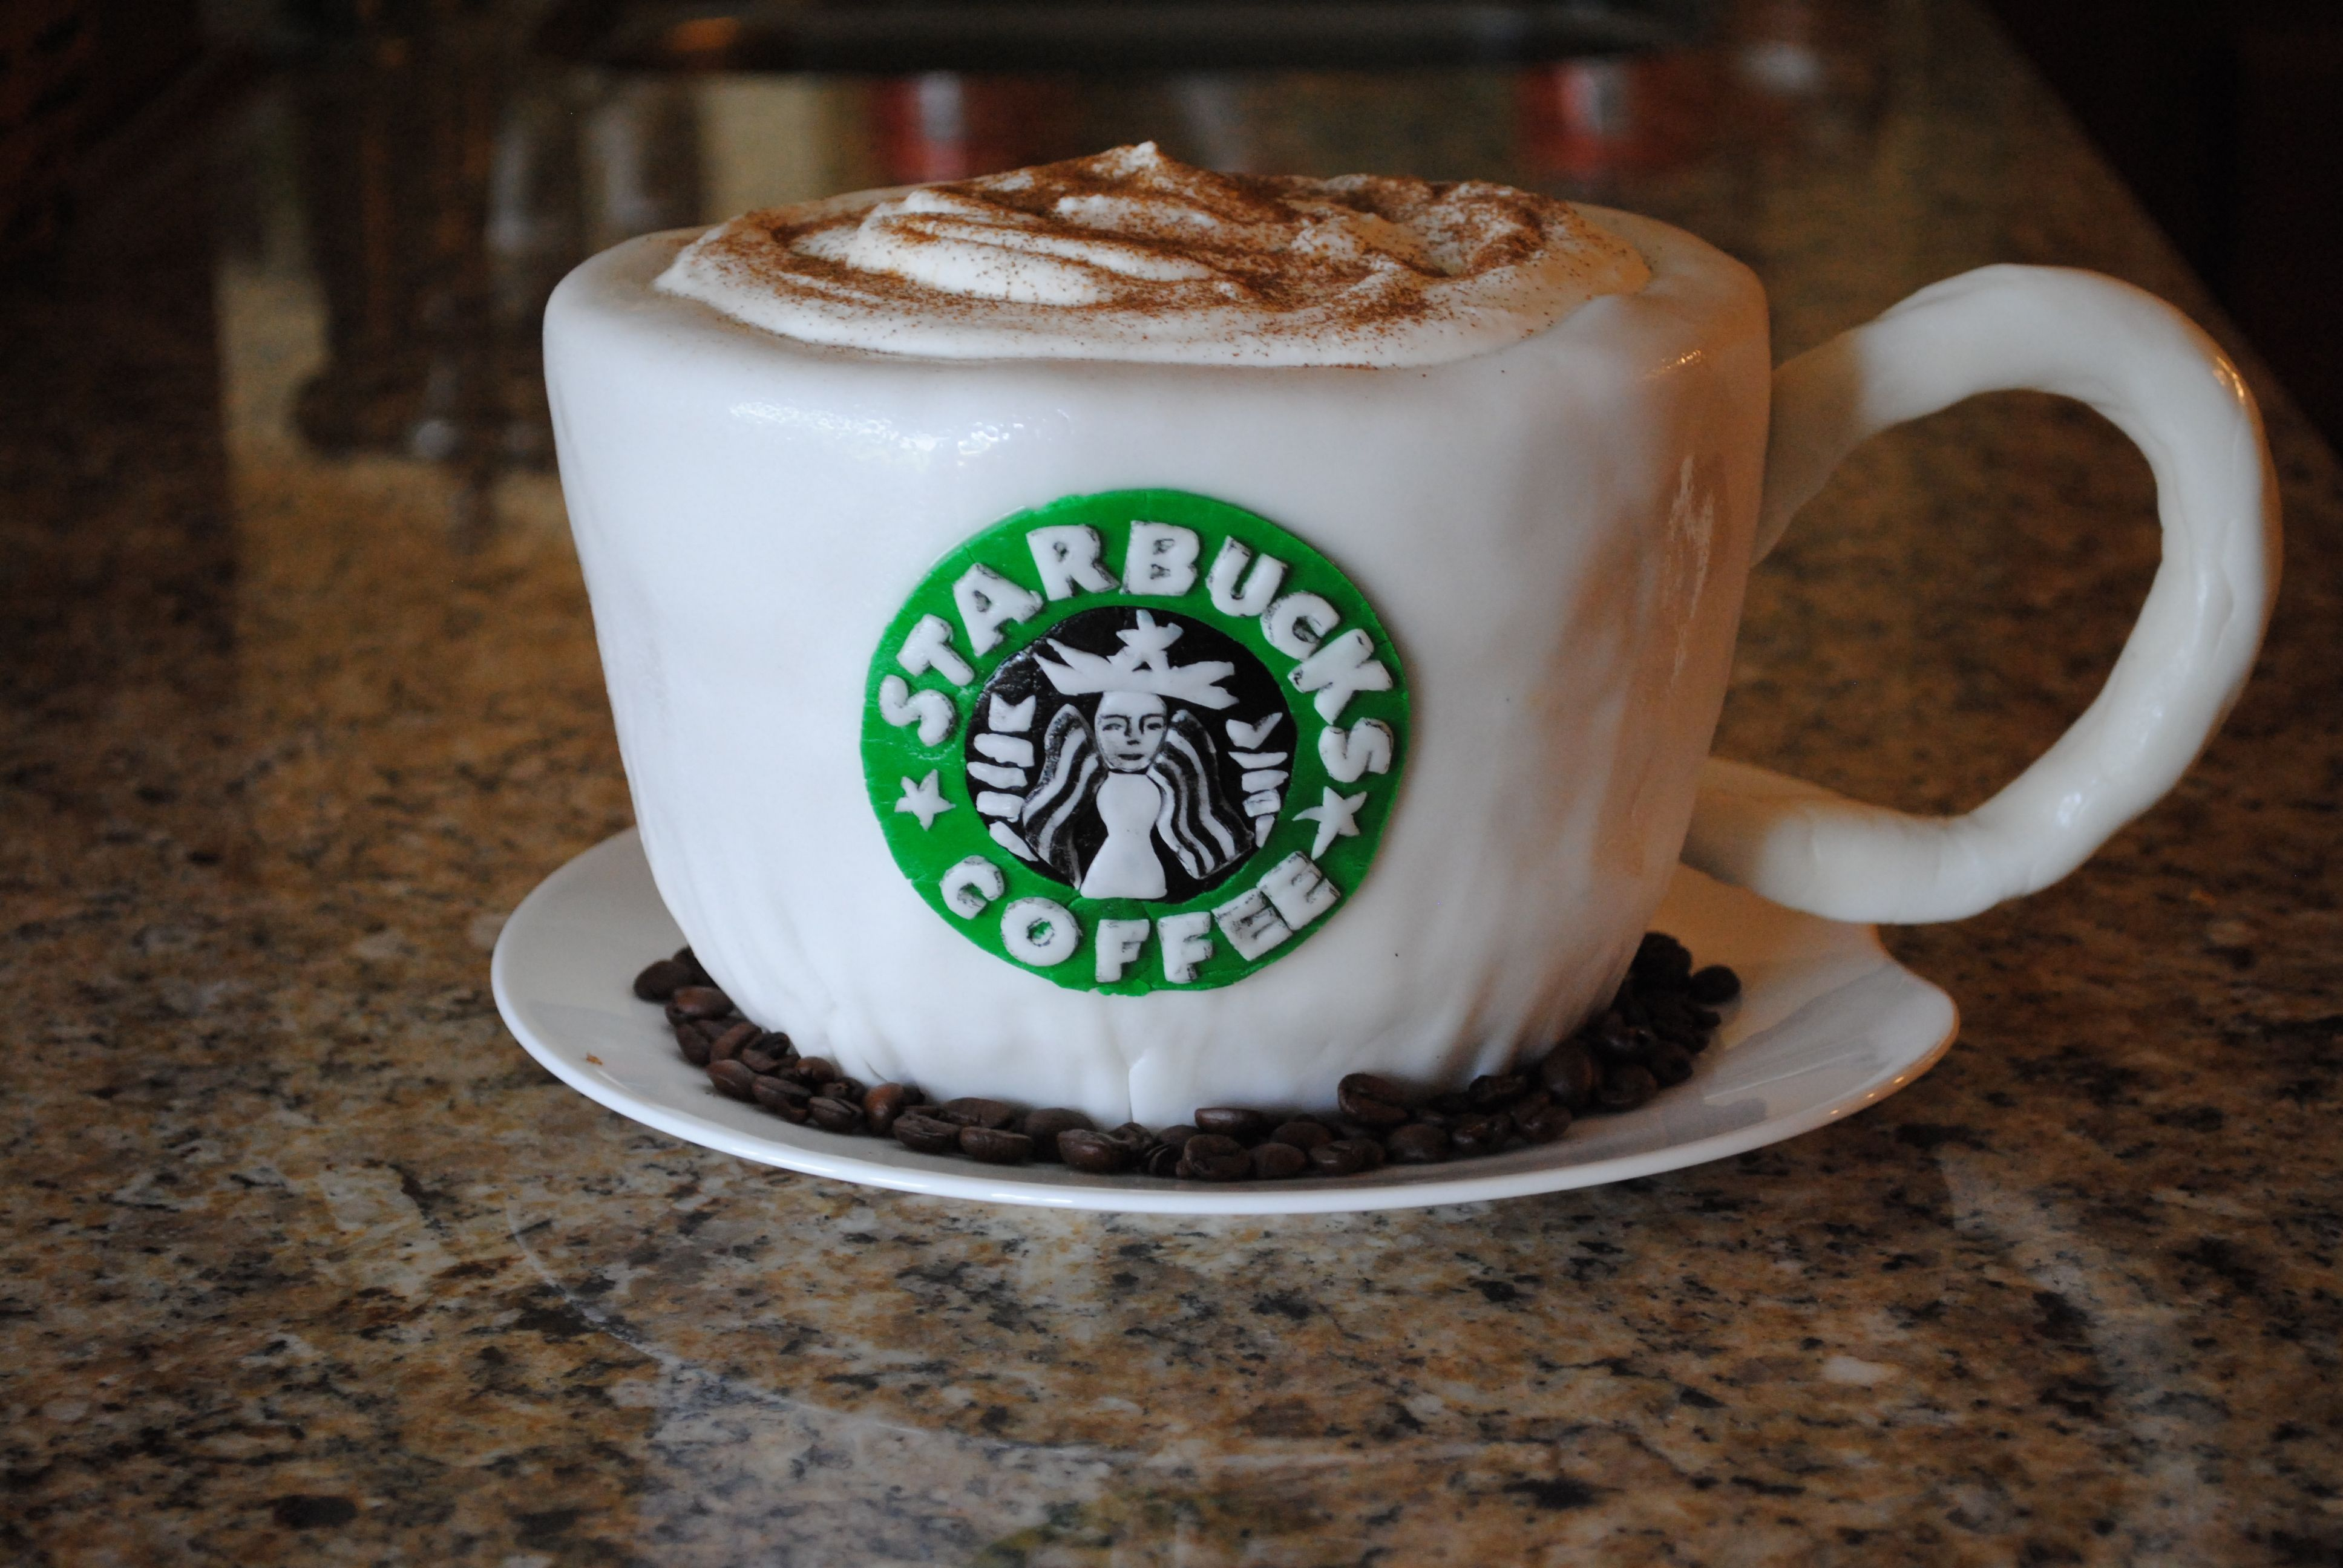 Starbucks Cake #starbuckscake Starbucks Cake #starbuckscake Starbucks Cake #starbuckscake Starbucks Cake #starbuckscake